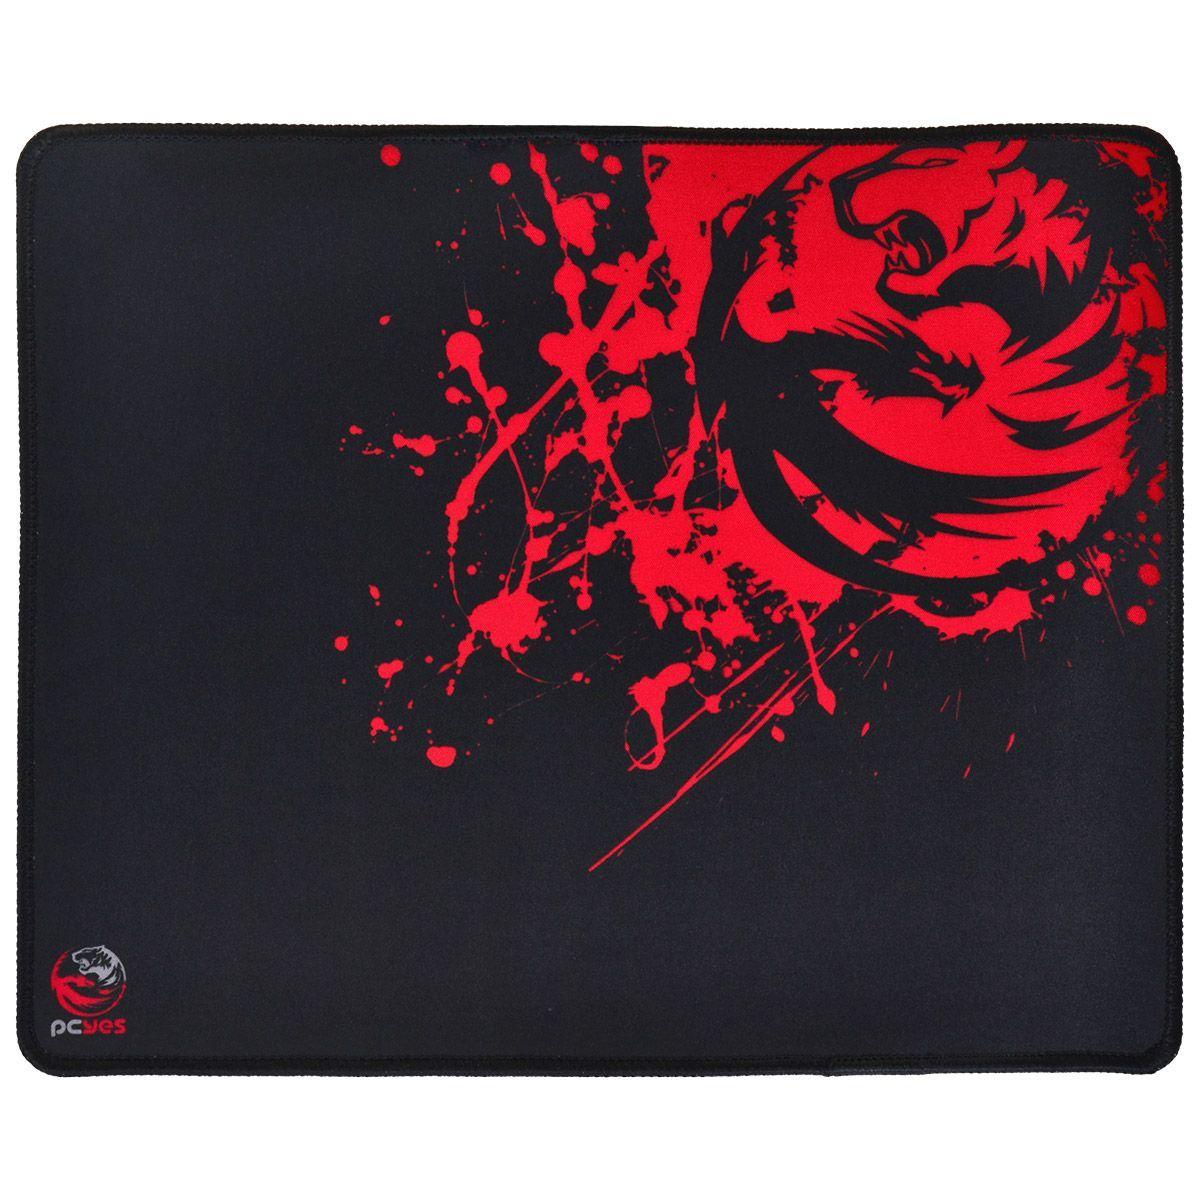 Mouse Pad Essential Splash 360X300mm ESP36X30 28990 - Pcyes